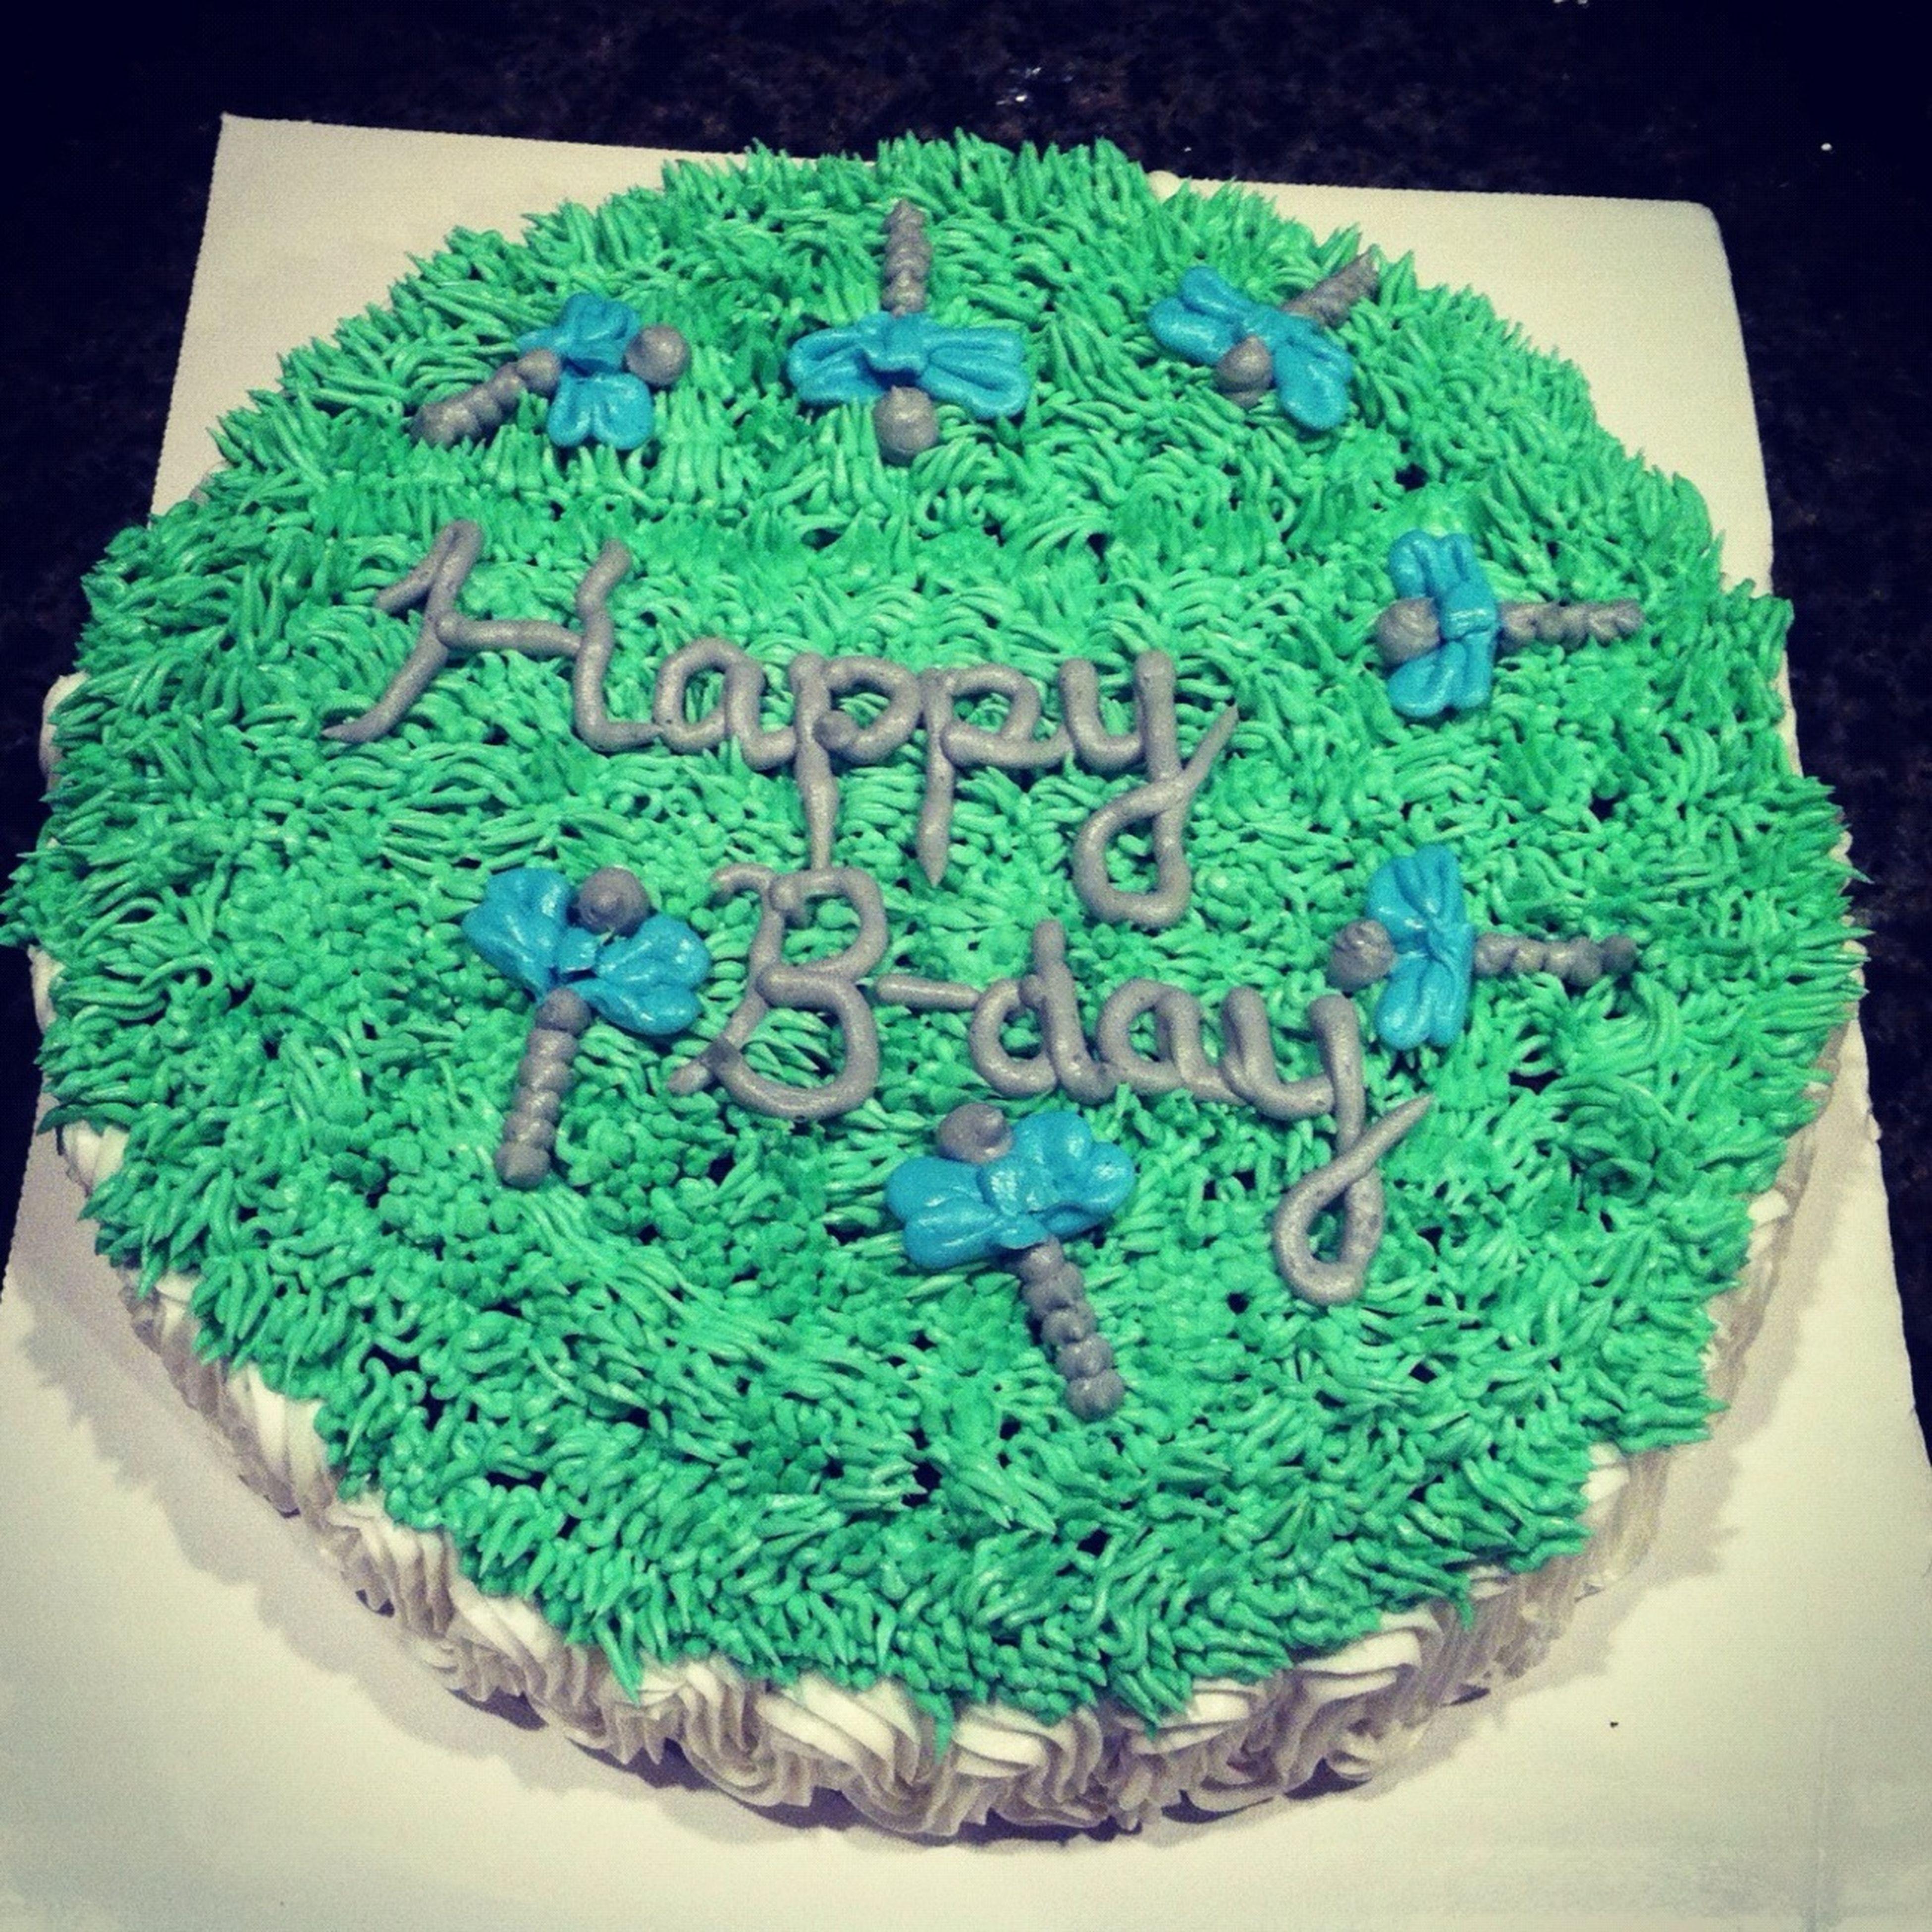 Dragonfly cake ($35)